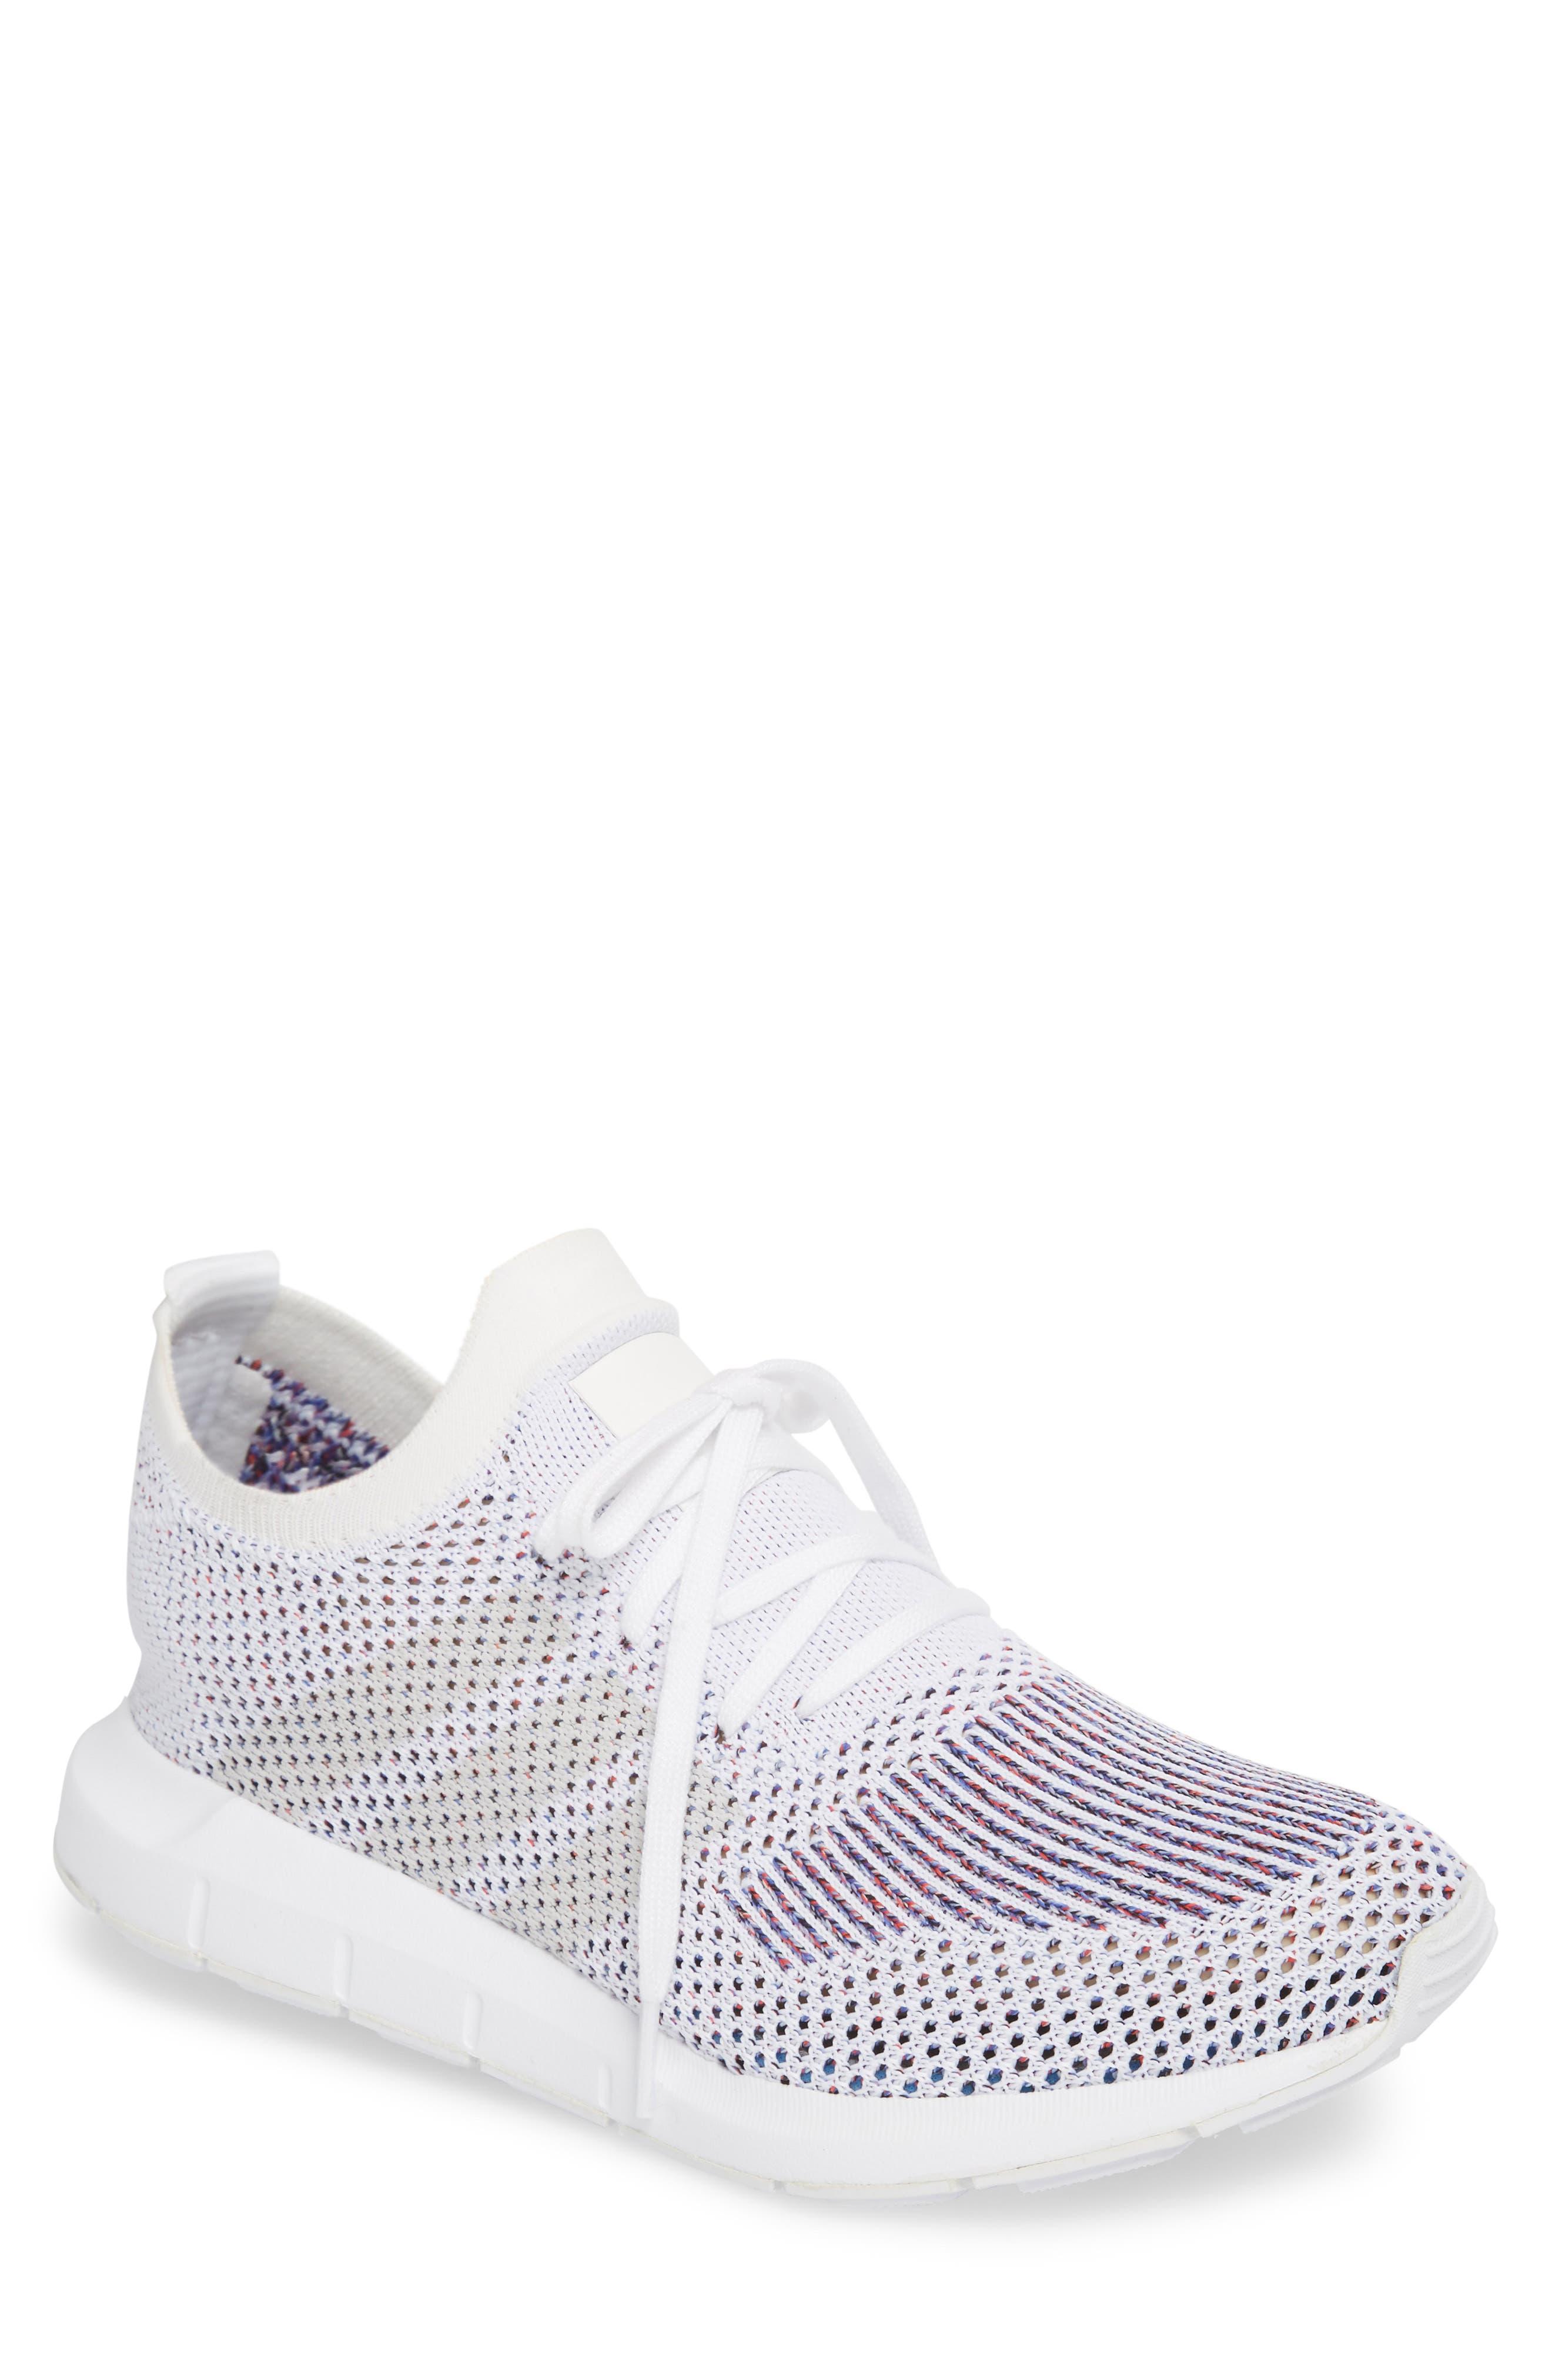 Swift Run Primeknit Training Shoe,                         Main,                         color, White/ Grey Heather Grey